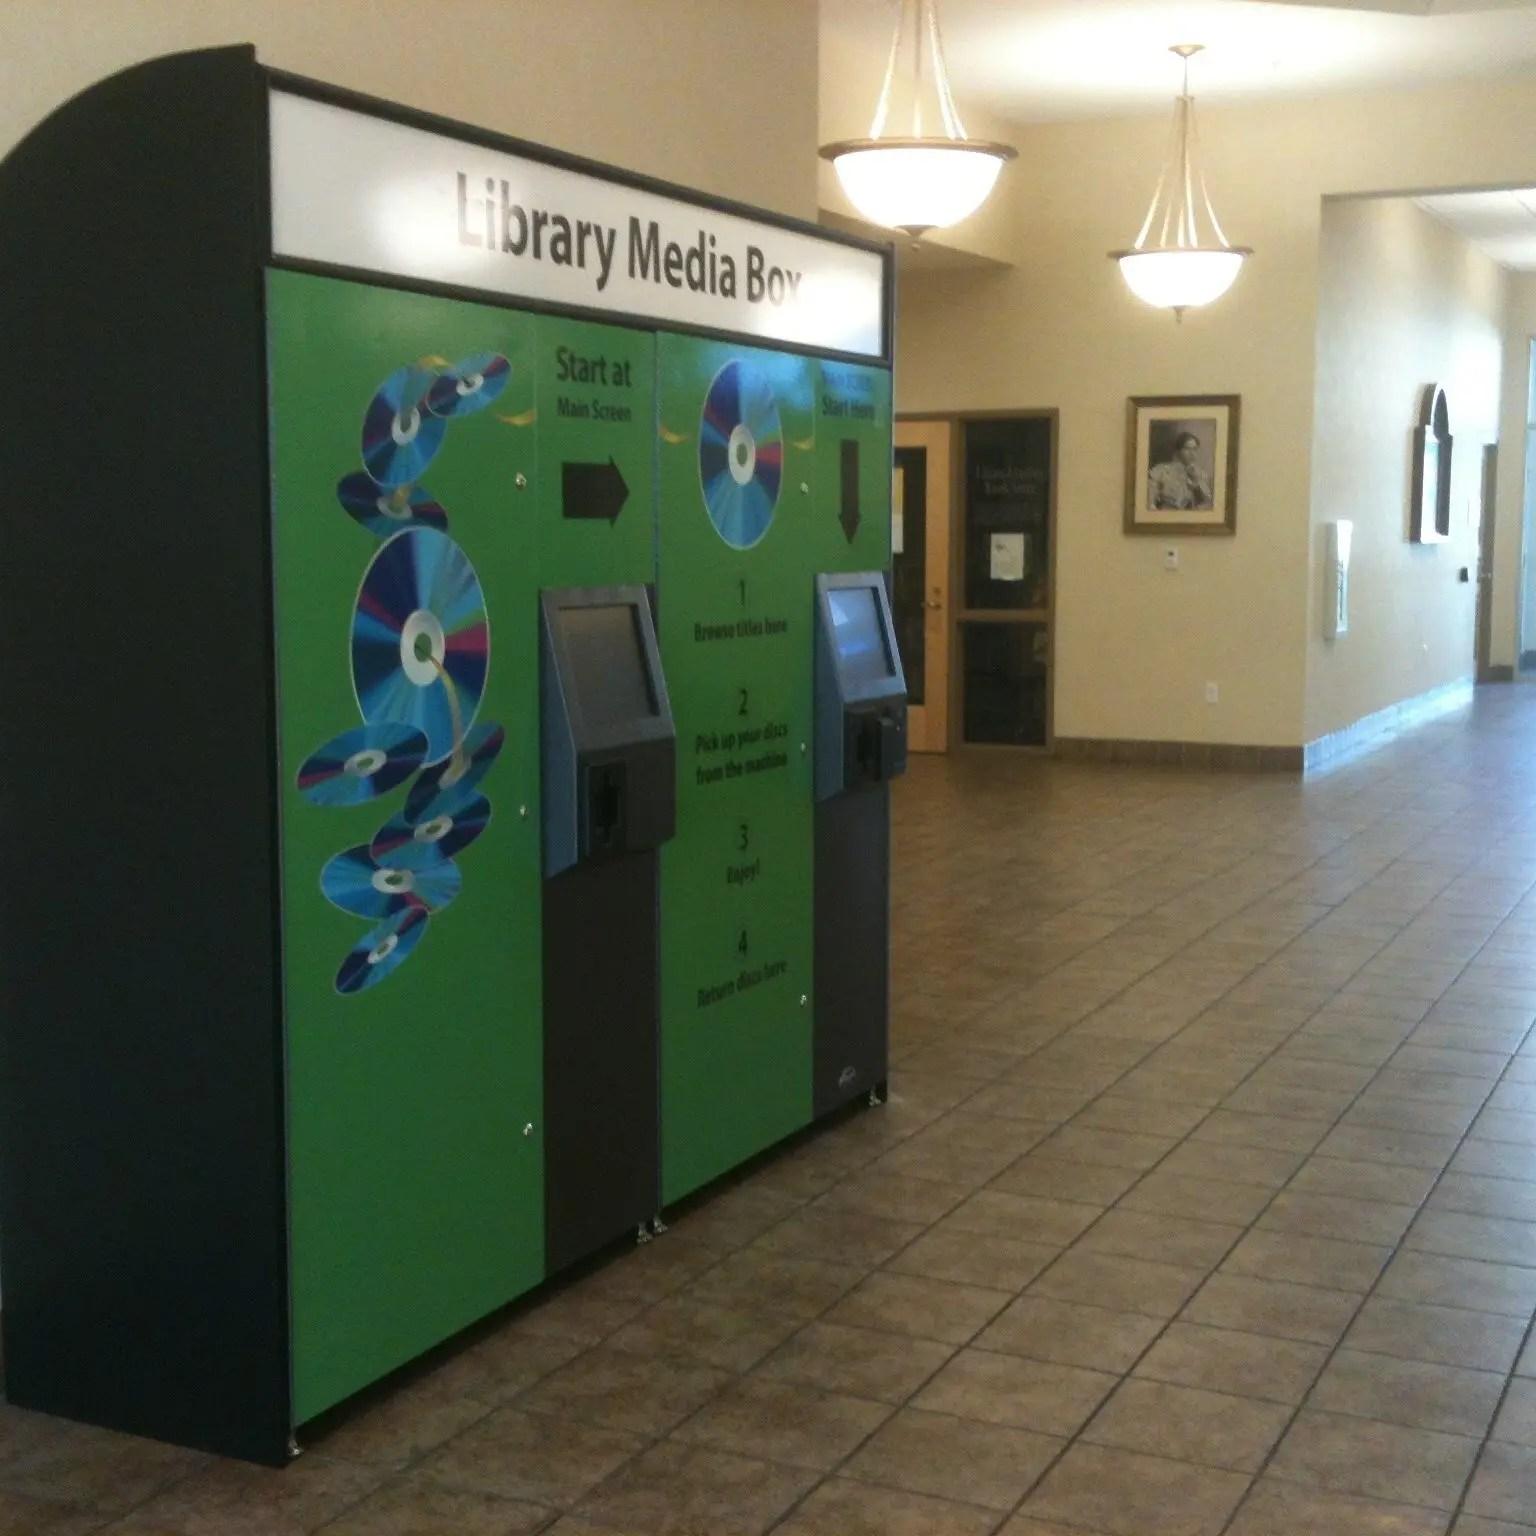 dvd lending machine